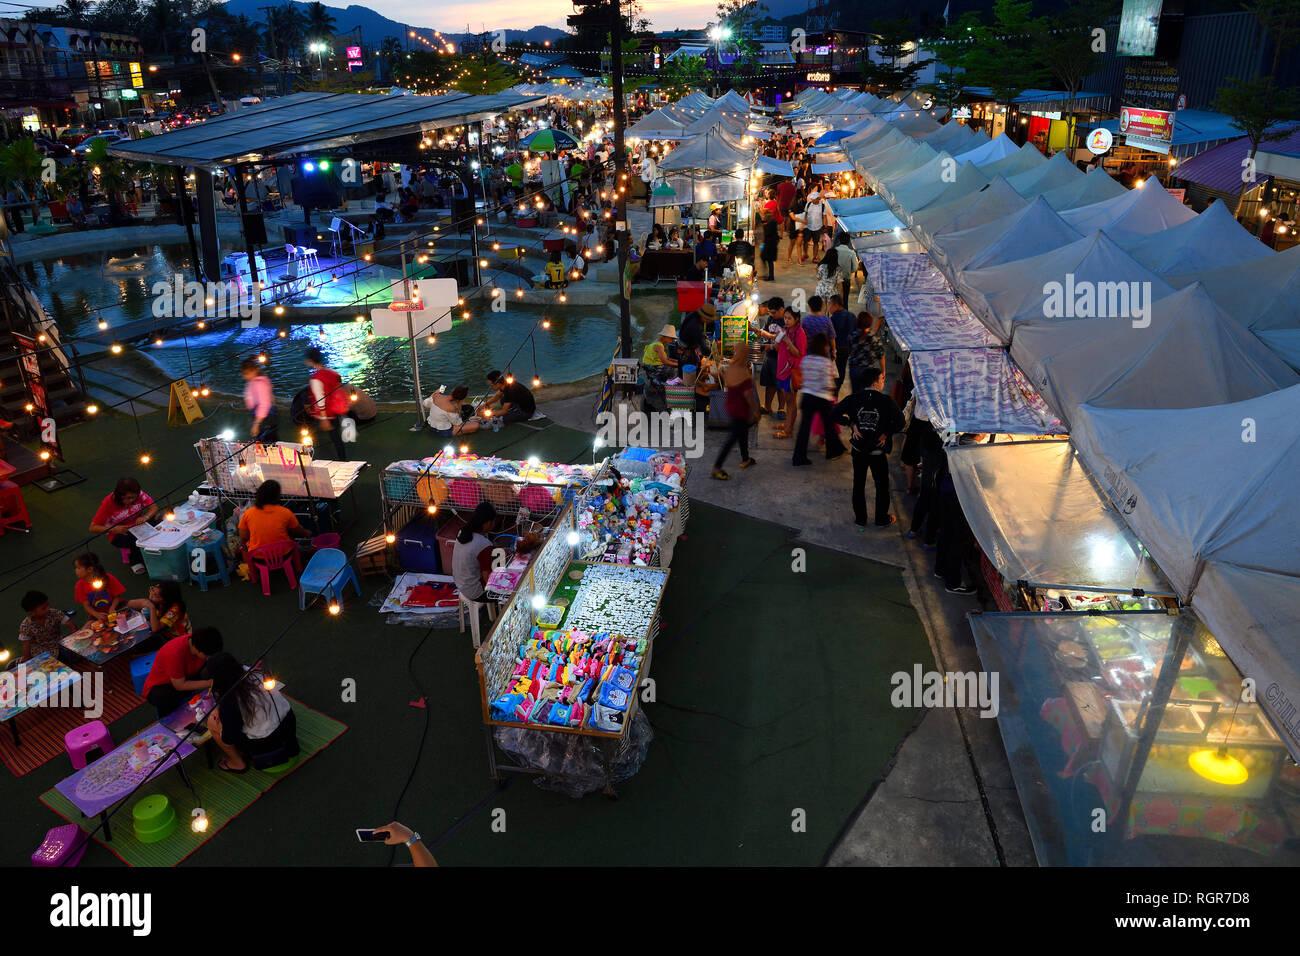 Chillva Markt, Phuket, Thailand - Stock Image